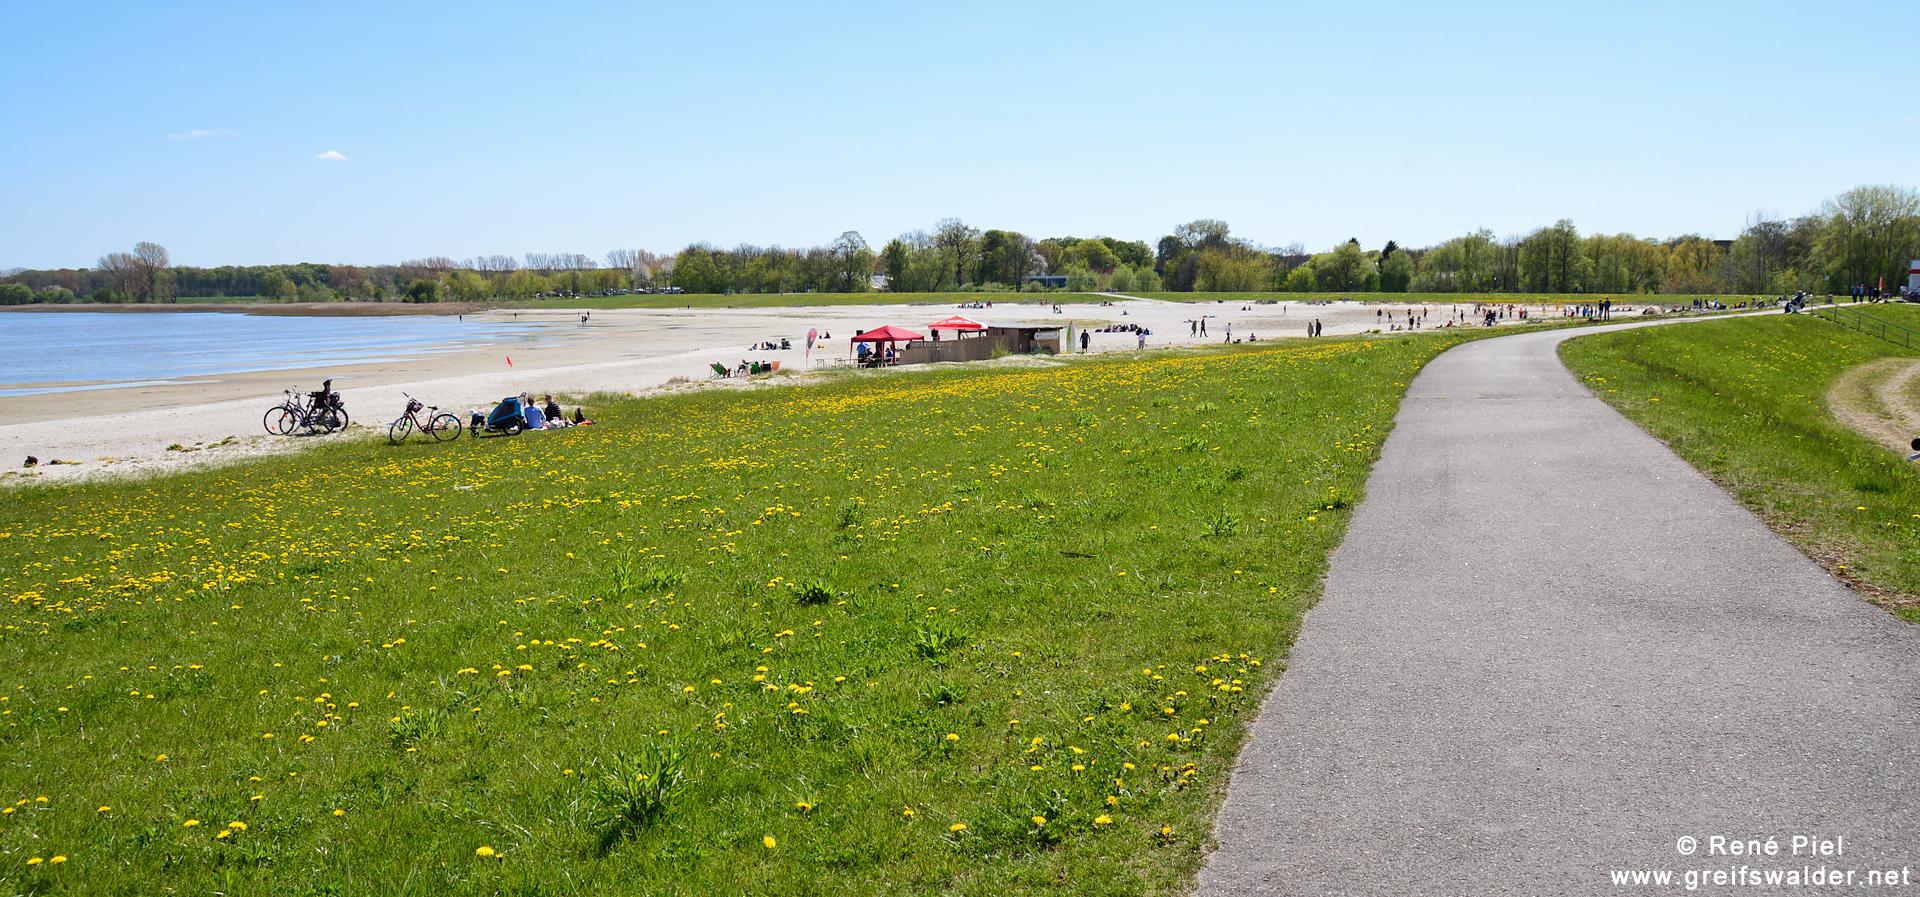 Herrentag - Strandbad Greifswald-Eldena gut besucht